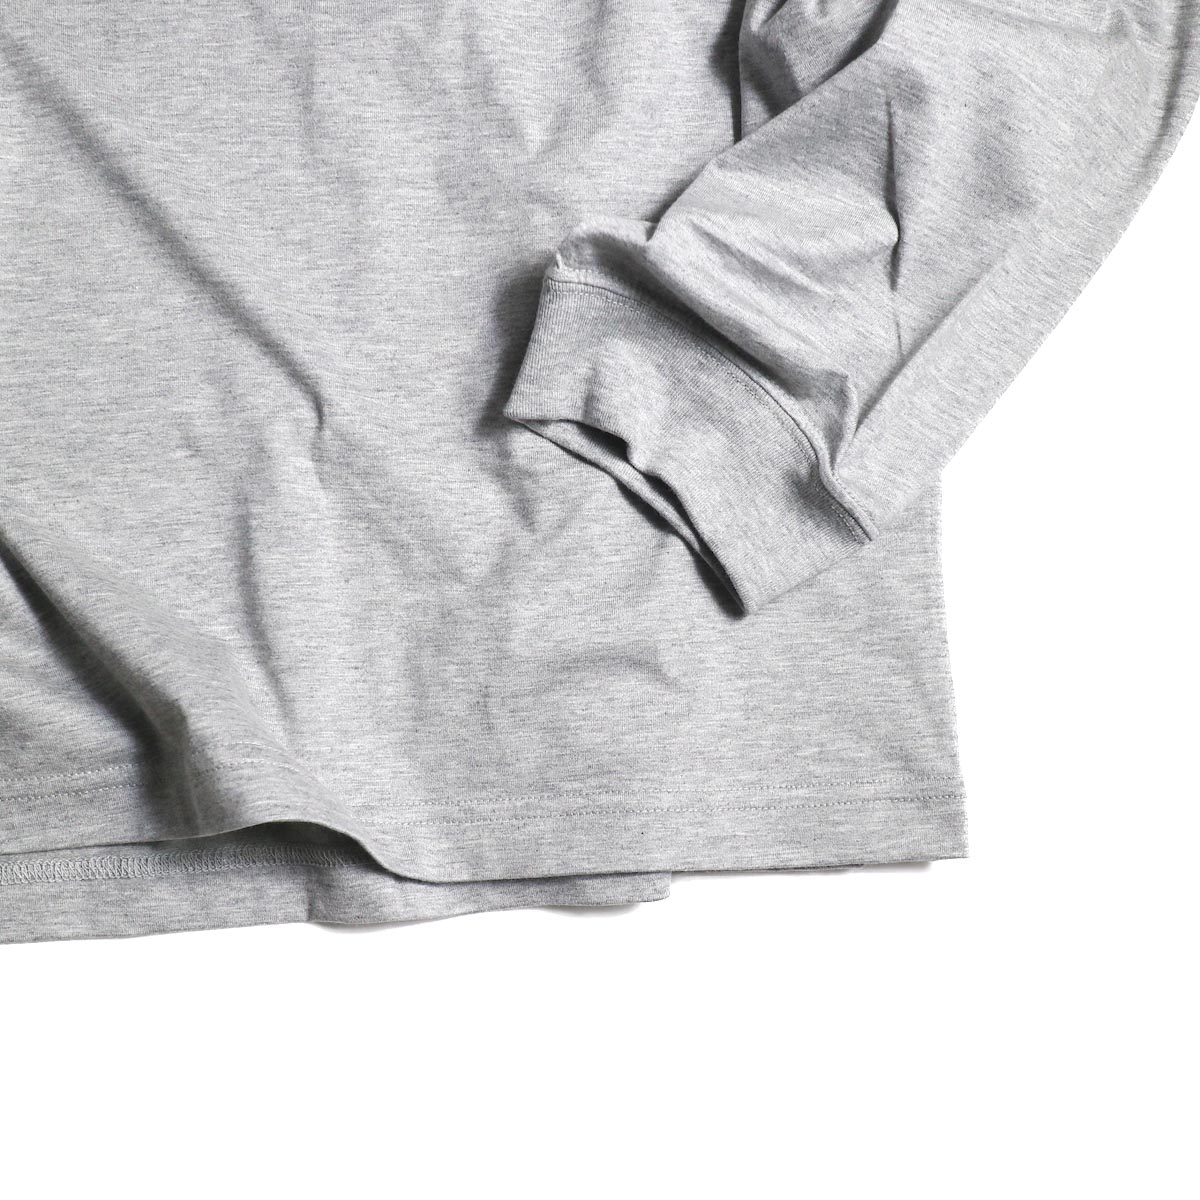 The Soloist / sc.0024AW20 oversized crew neck l/s tee. -ADALBERT-袖、裾